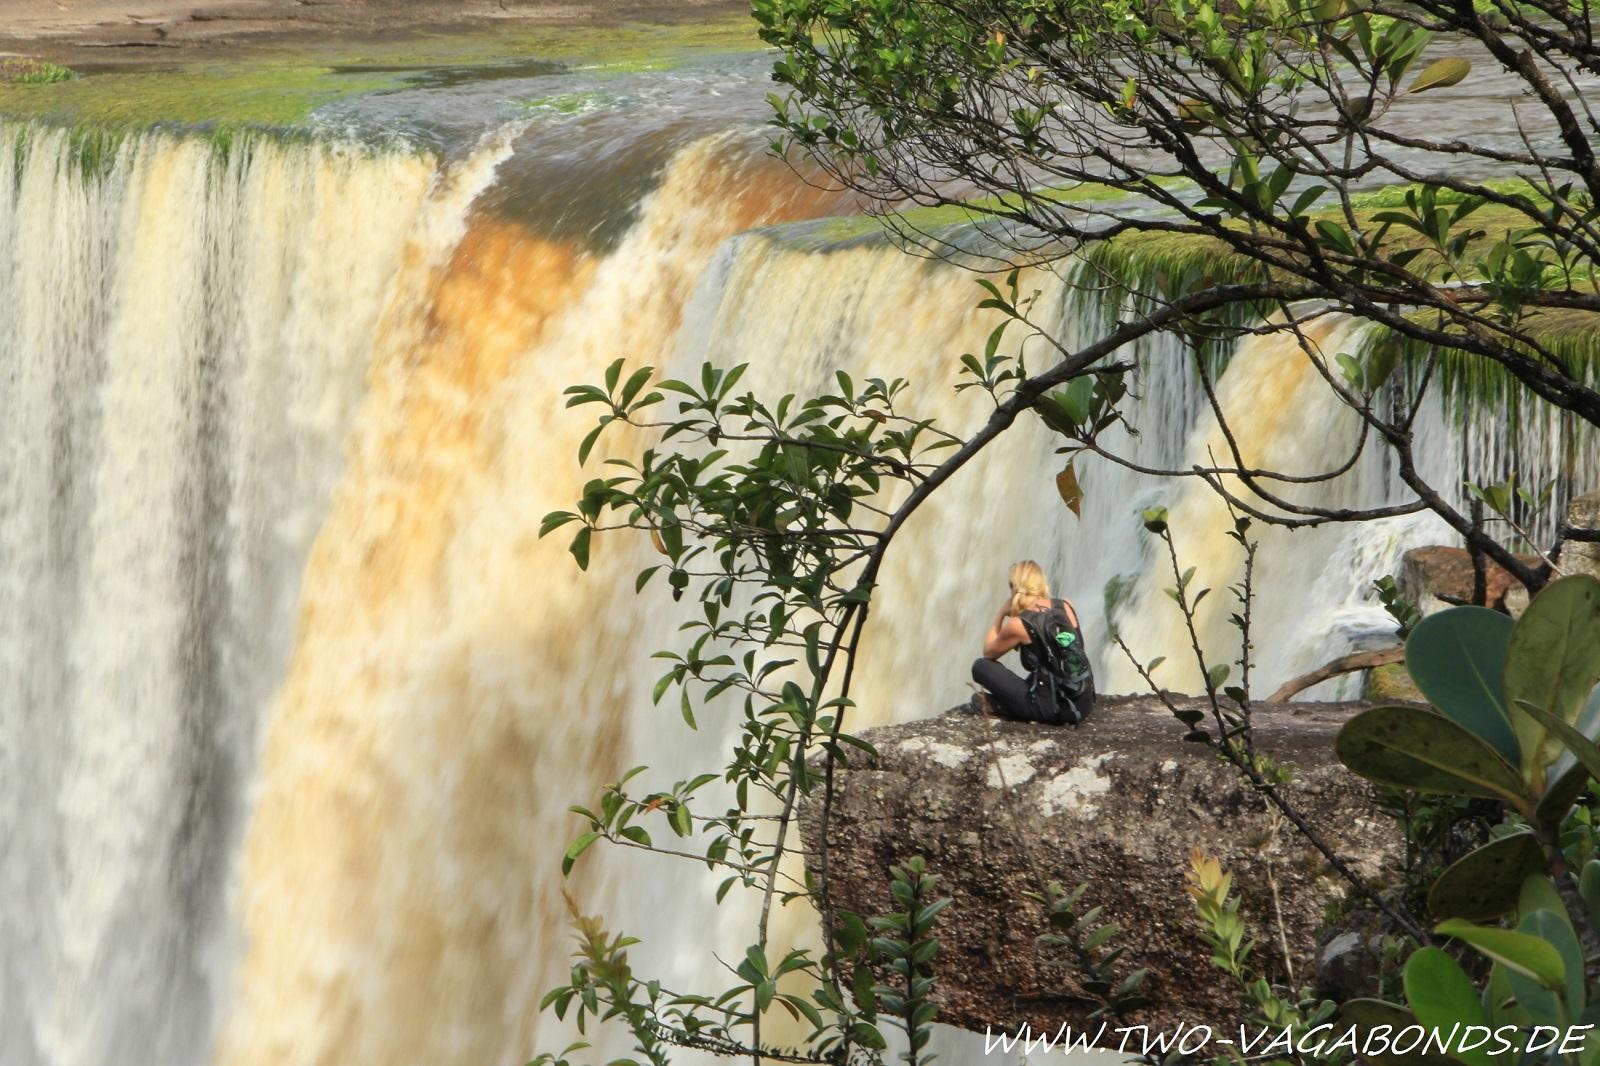 GUYANA 2014 - KAITEUR-FALLS